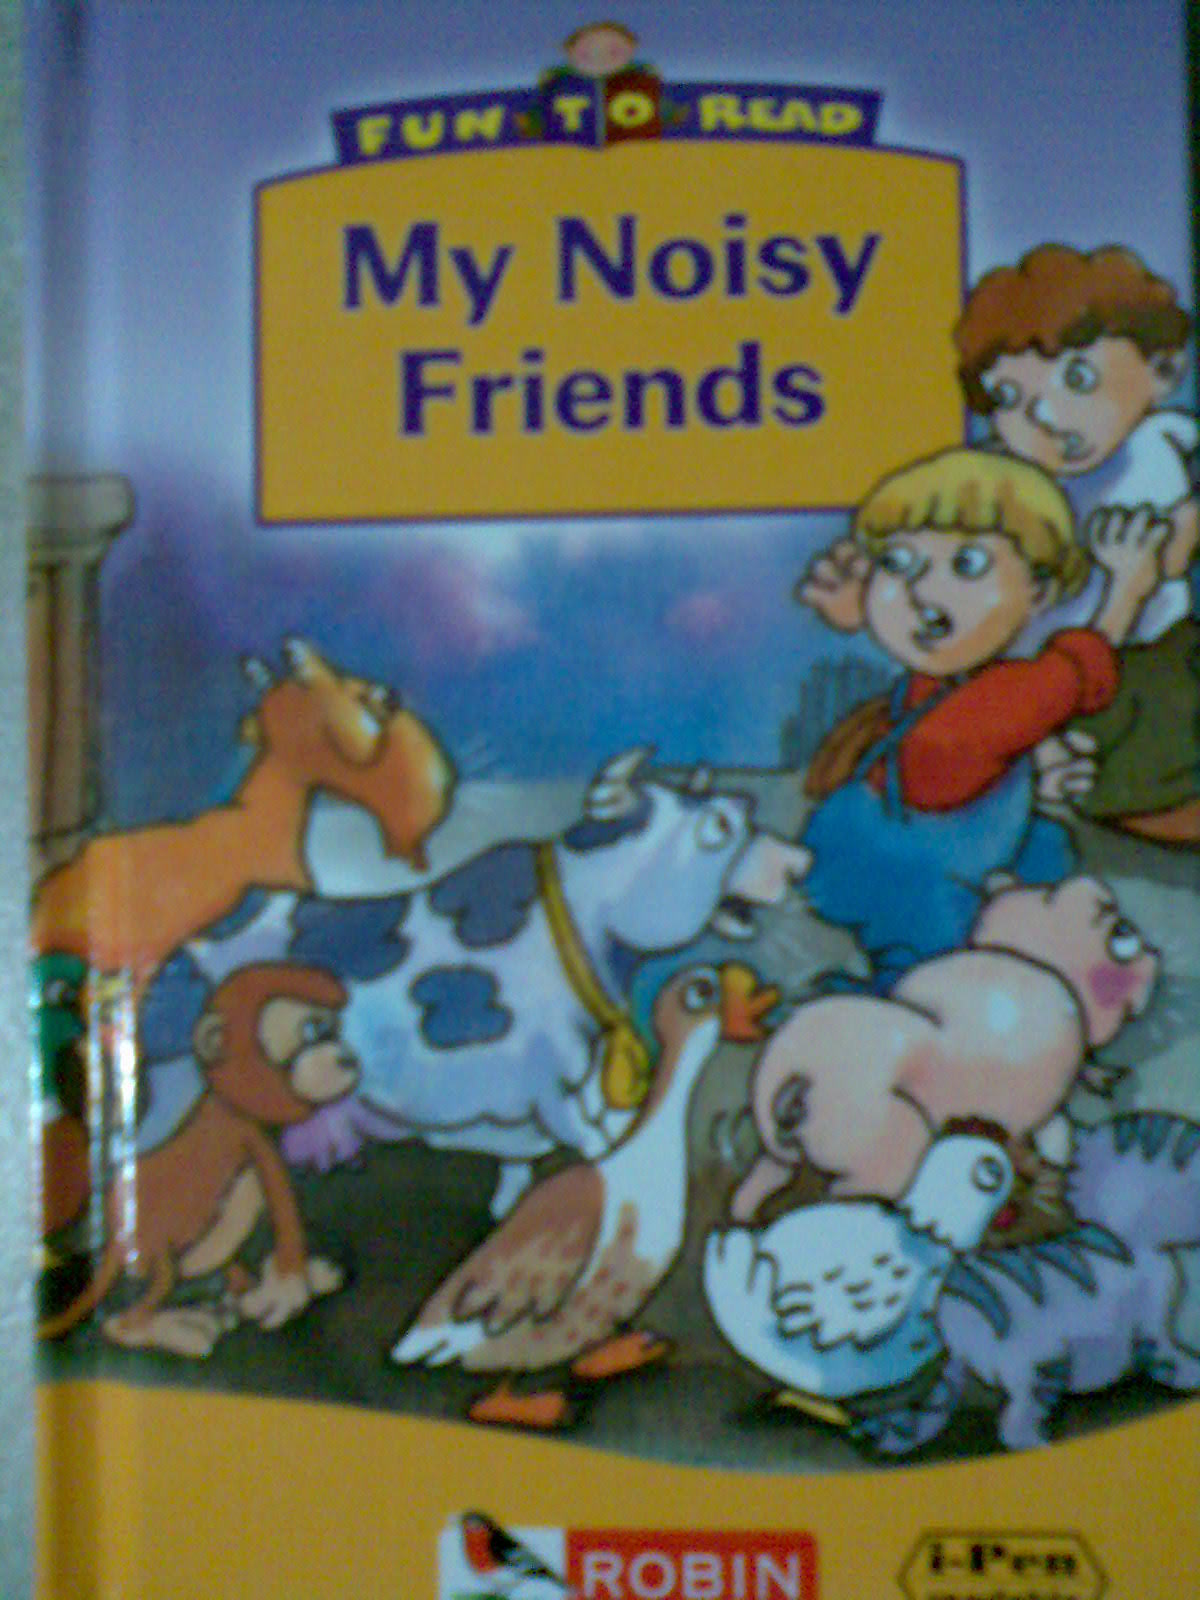 My noisy friends